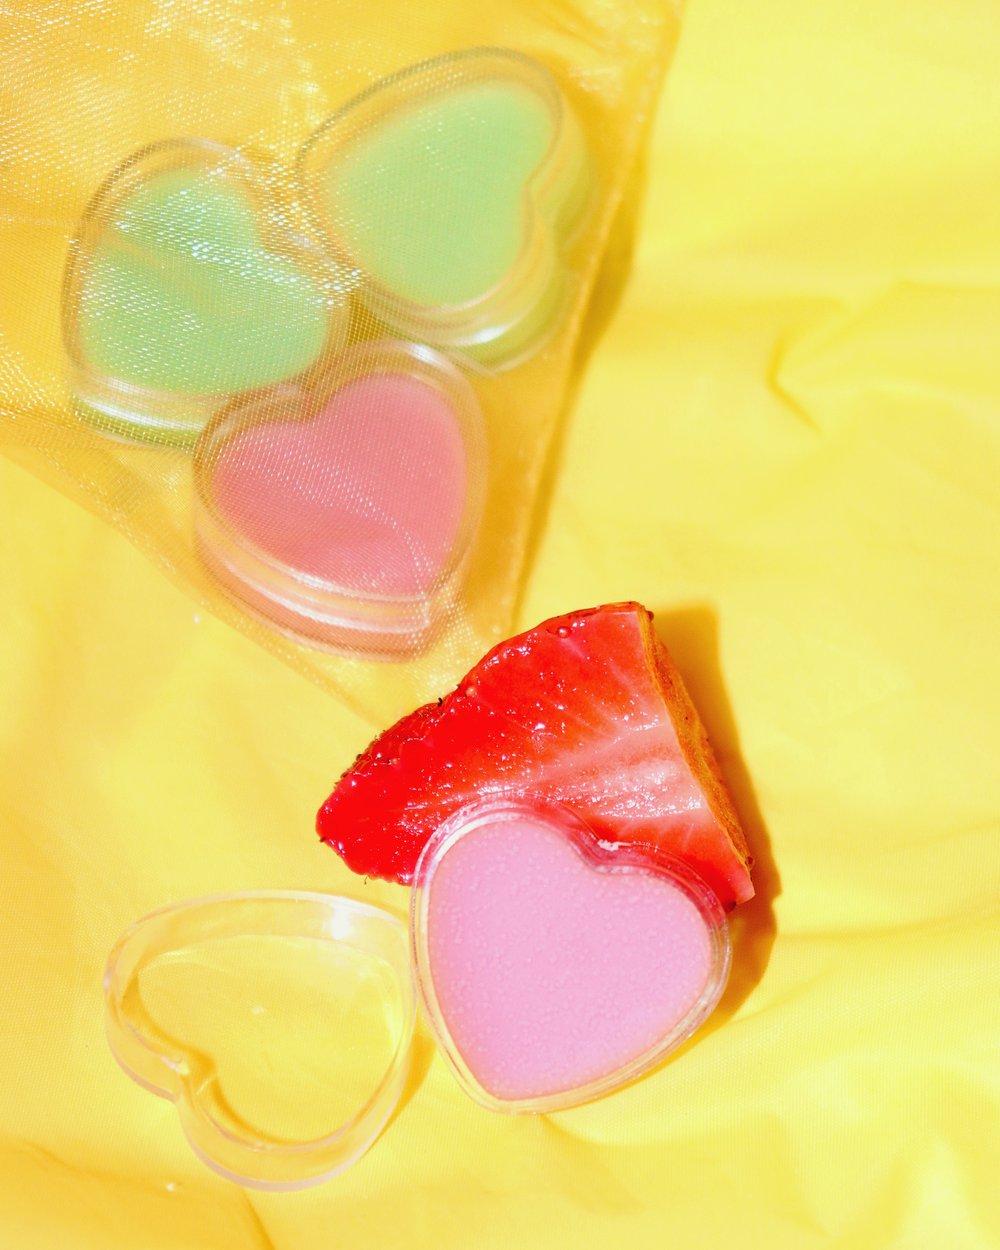 Image of STRAWBERRY 🍓 KIWI 🥝 lip balm duo